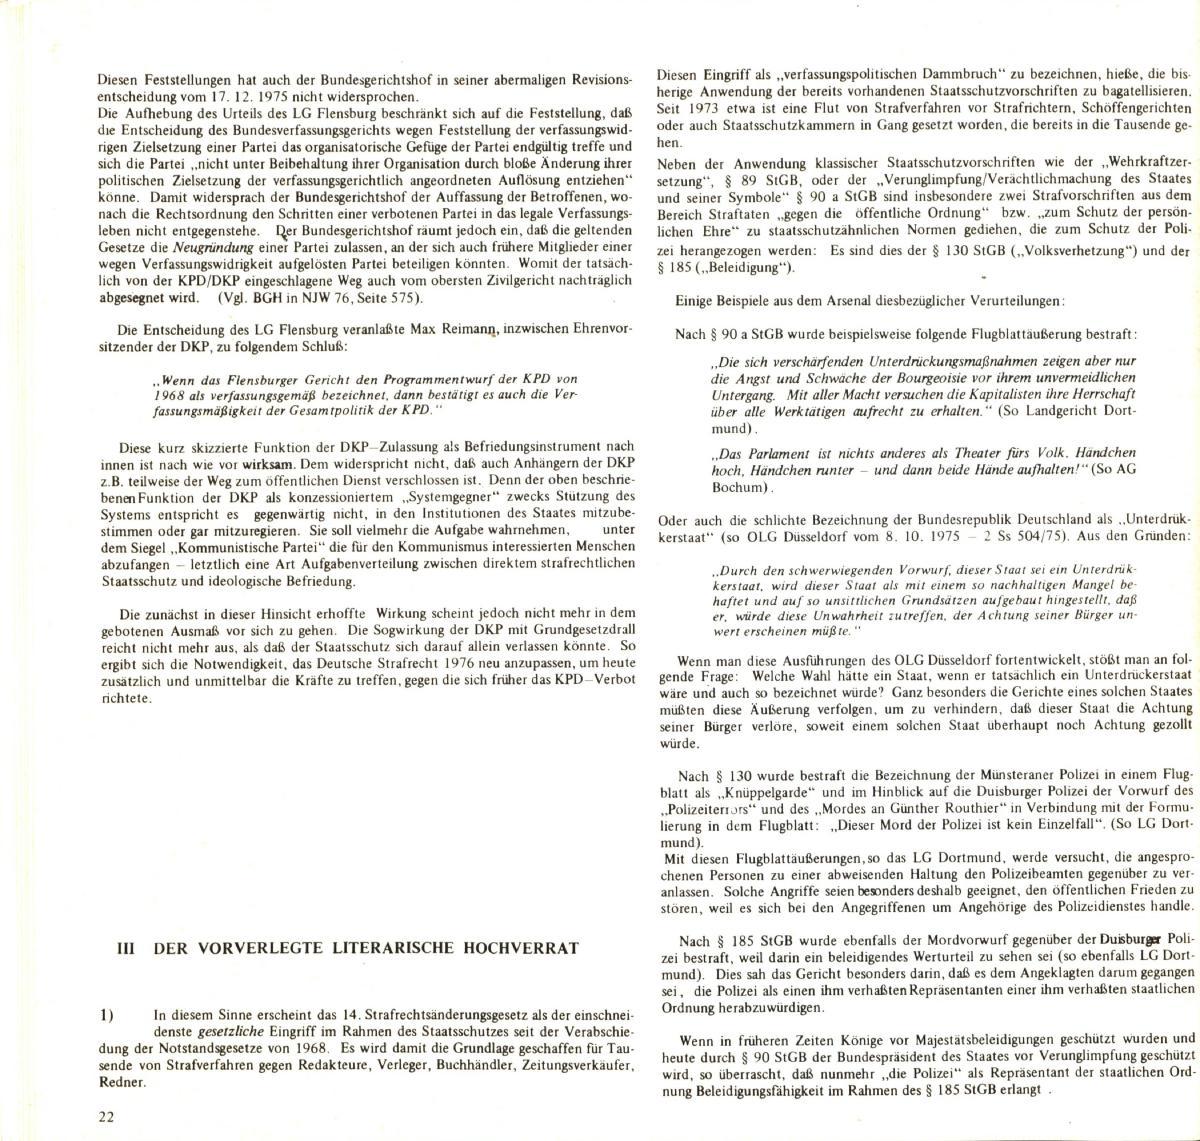 REP_VLB_1976_Die_Zensurgesetze_23